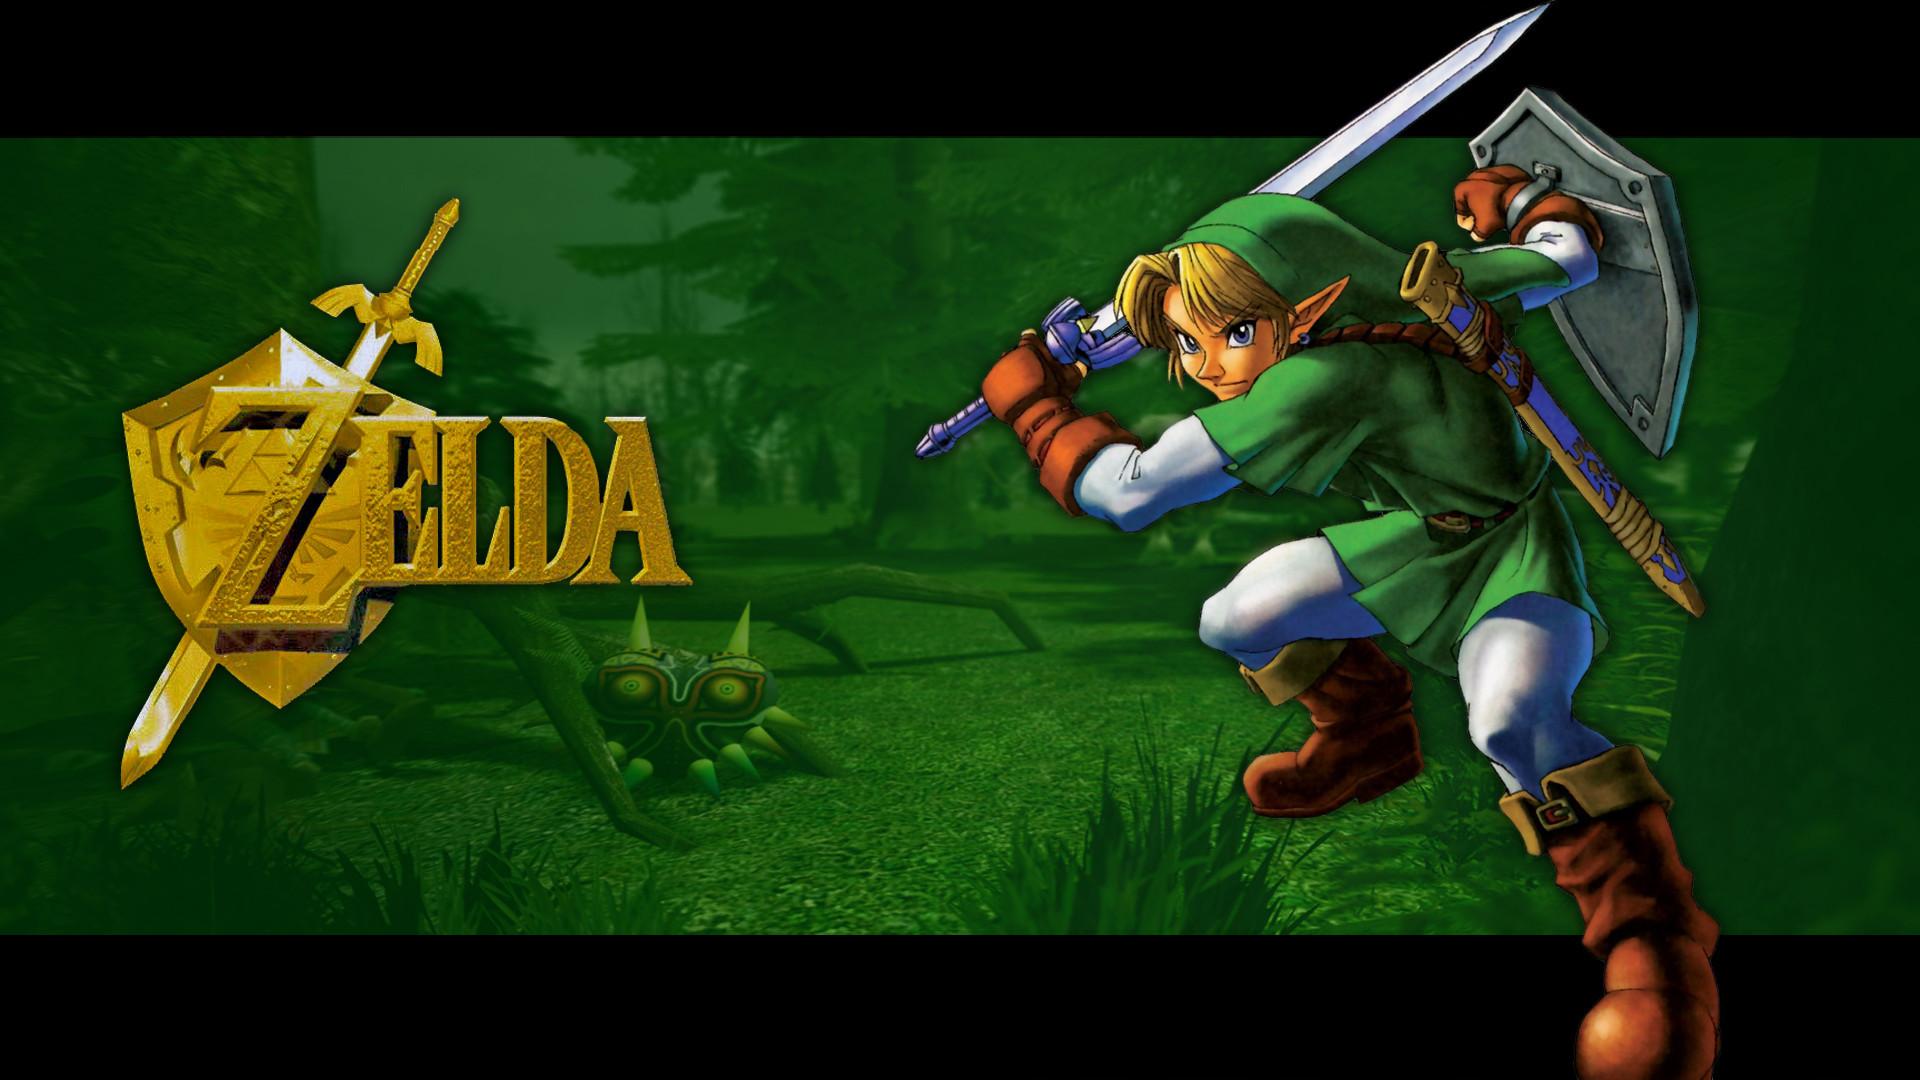 The Legend Of Zelda Wallpaper Hd 17183 Wallpaper Wallpaper hd 1920x1080